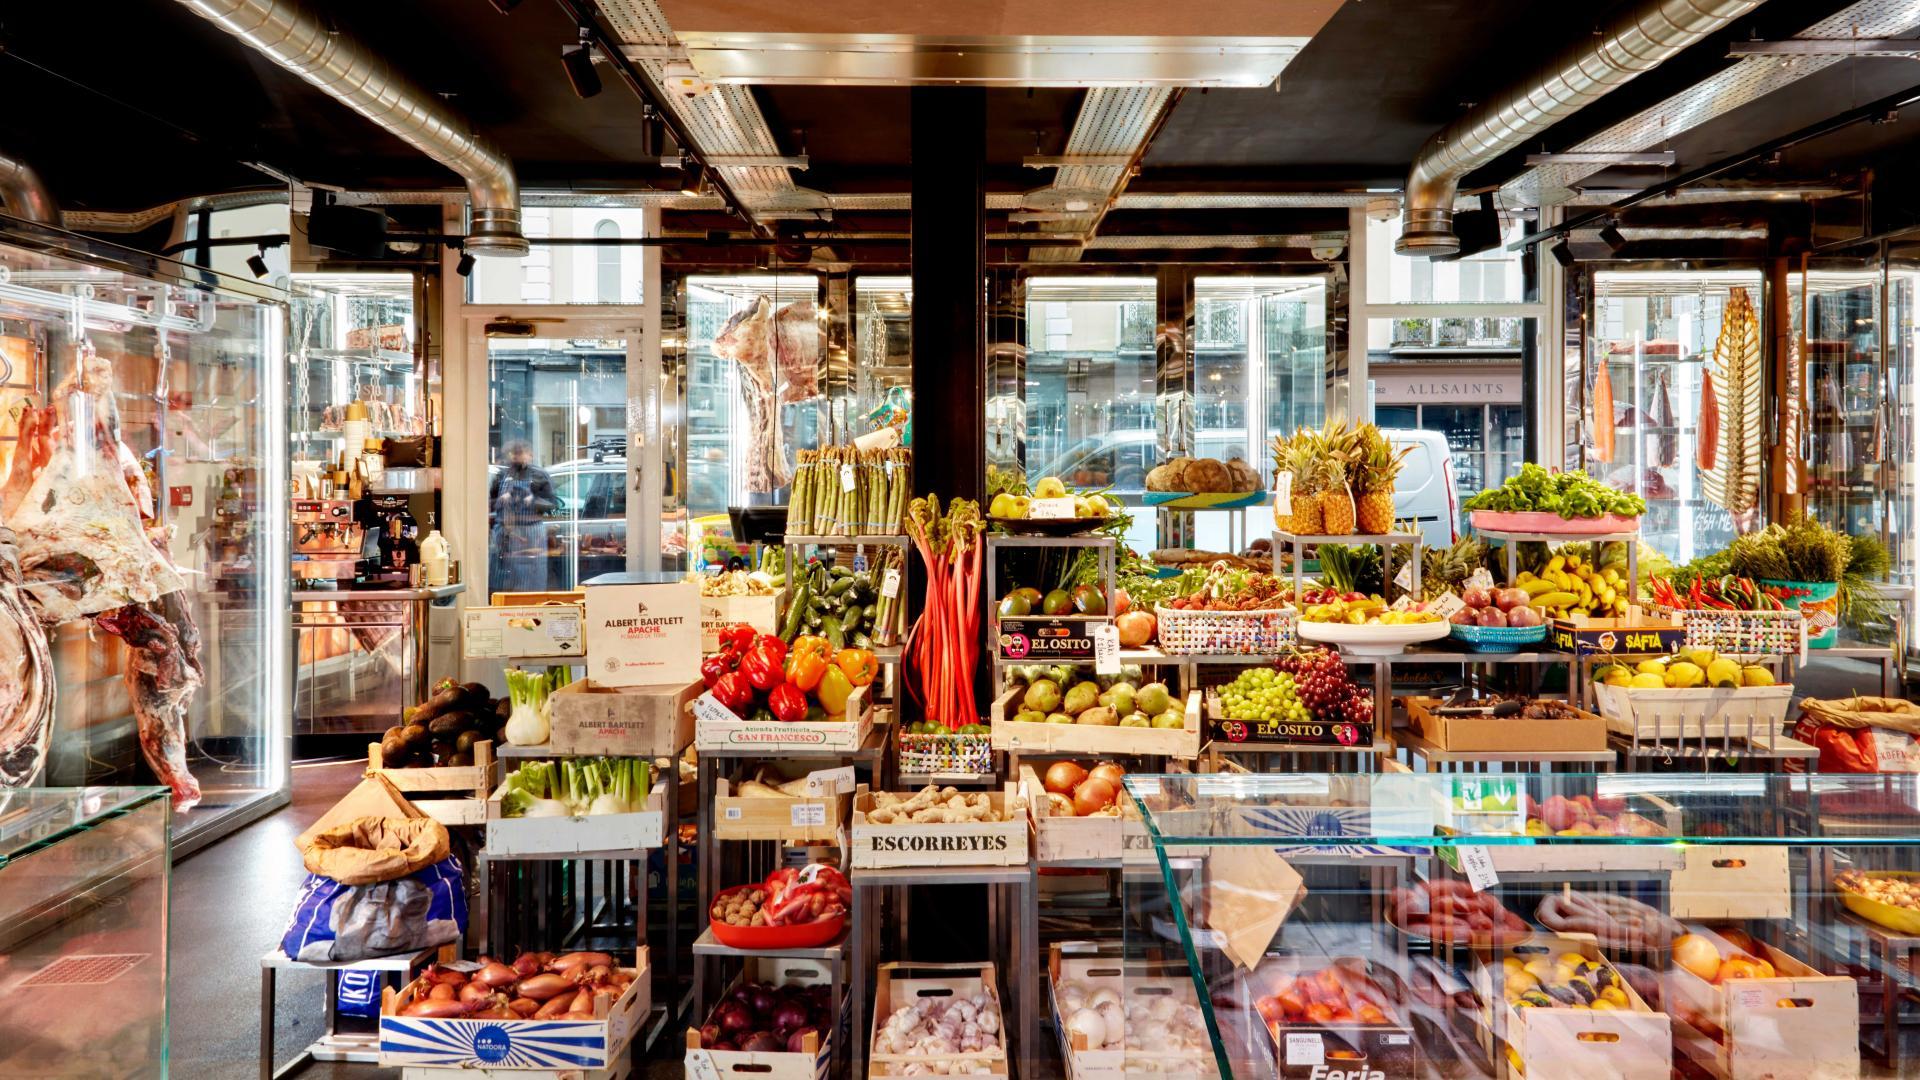 Best butchers London: fresh veg at Notting Hill Fish + Meat